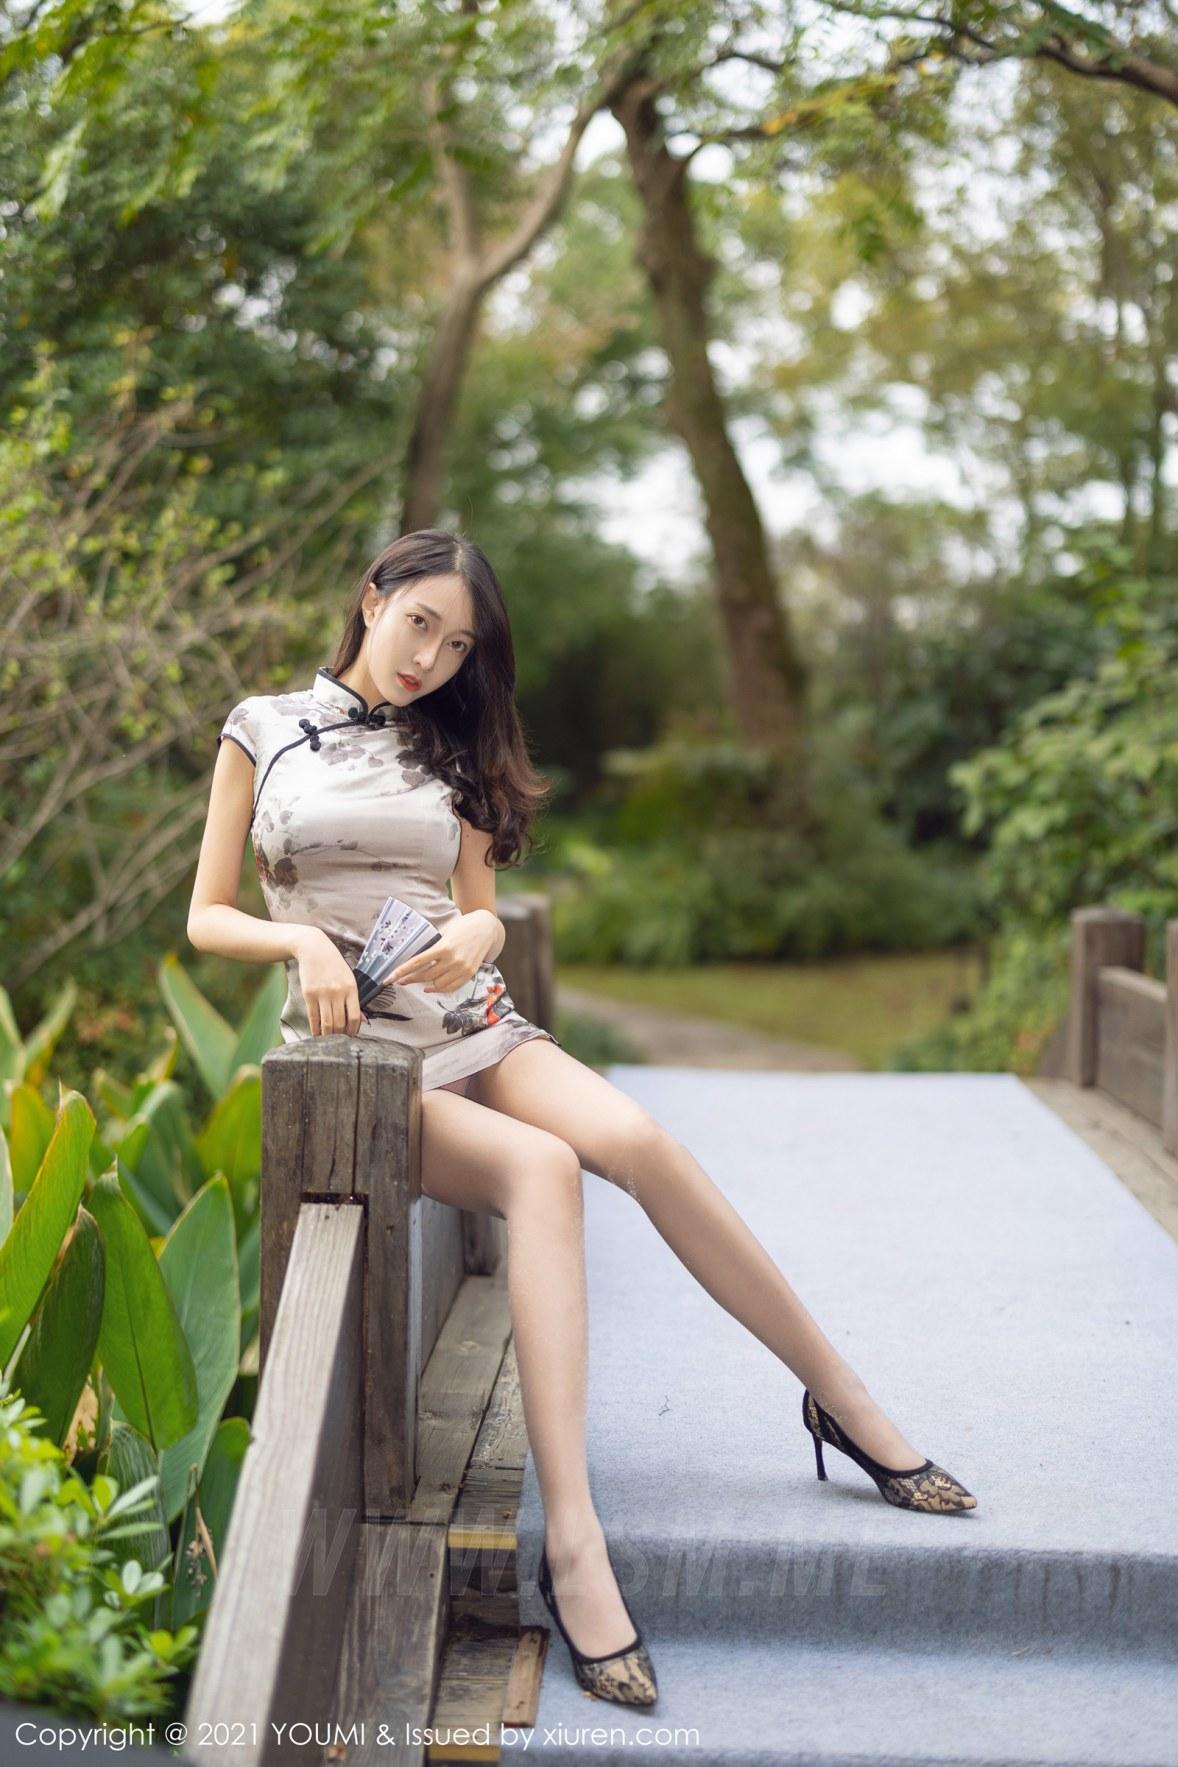 635 032 lb1 3600 5400 - YOUMI 尤蜜荟 Vol.635  浪漫旗袍 玥儿玥er - 尤蜜荟 -【免费在线写真】【丽人丝语】